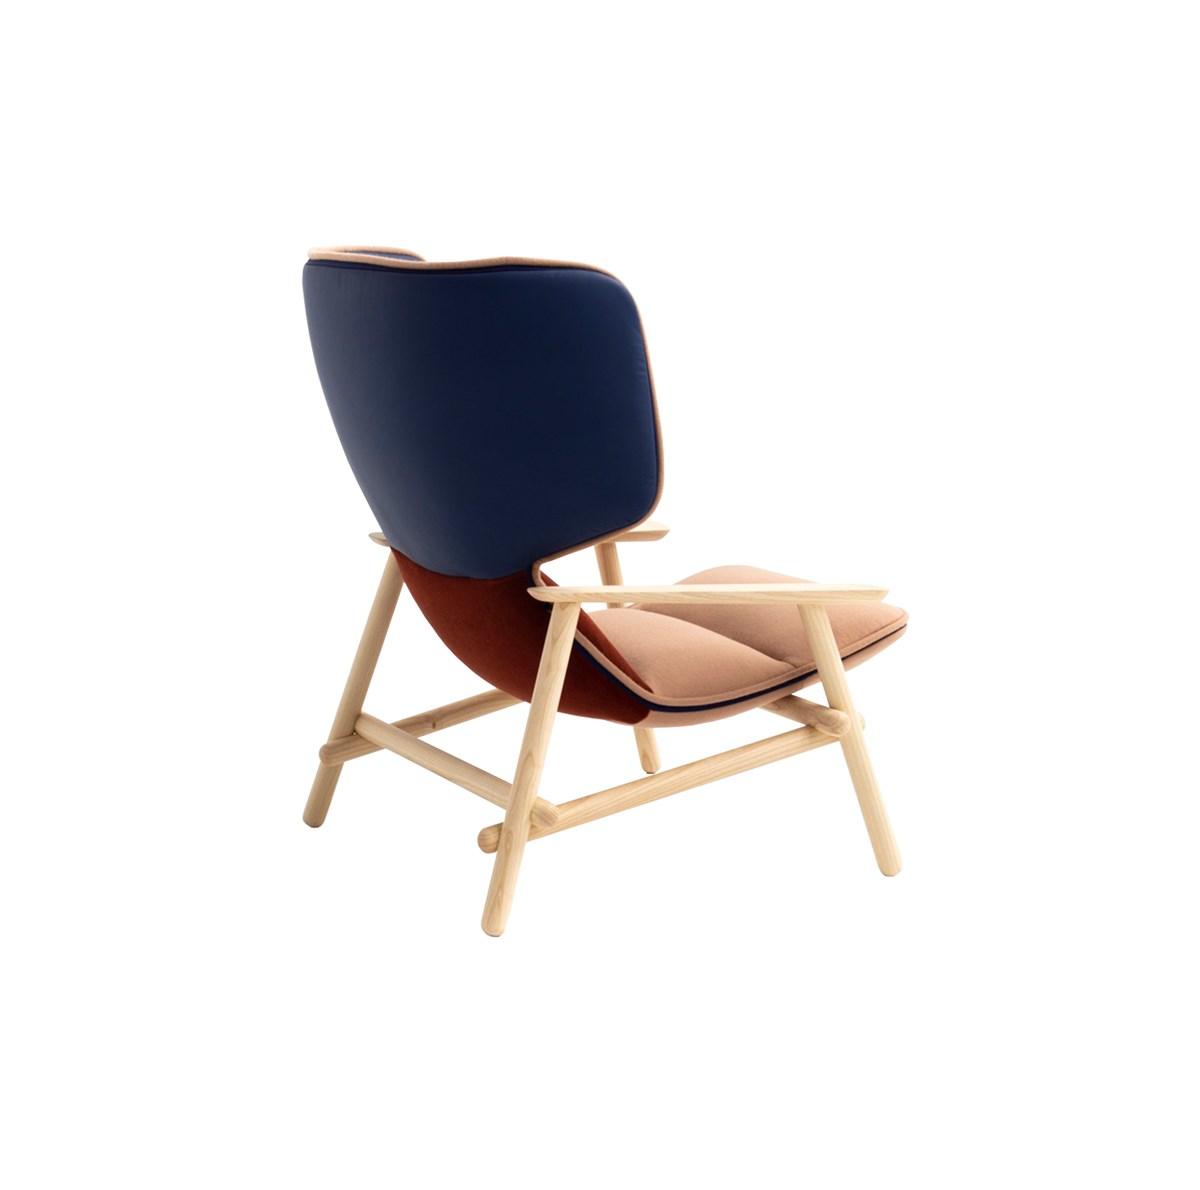 Moroso-Patricia-Urquiola-Lilo-Wing-Armchair-Matisse-2